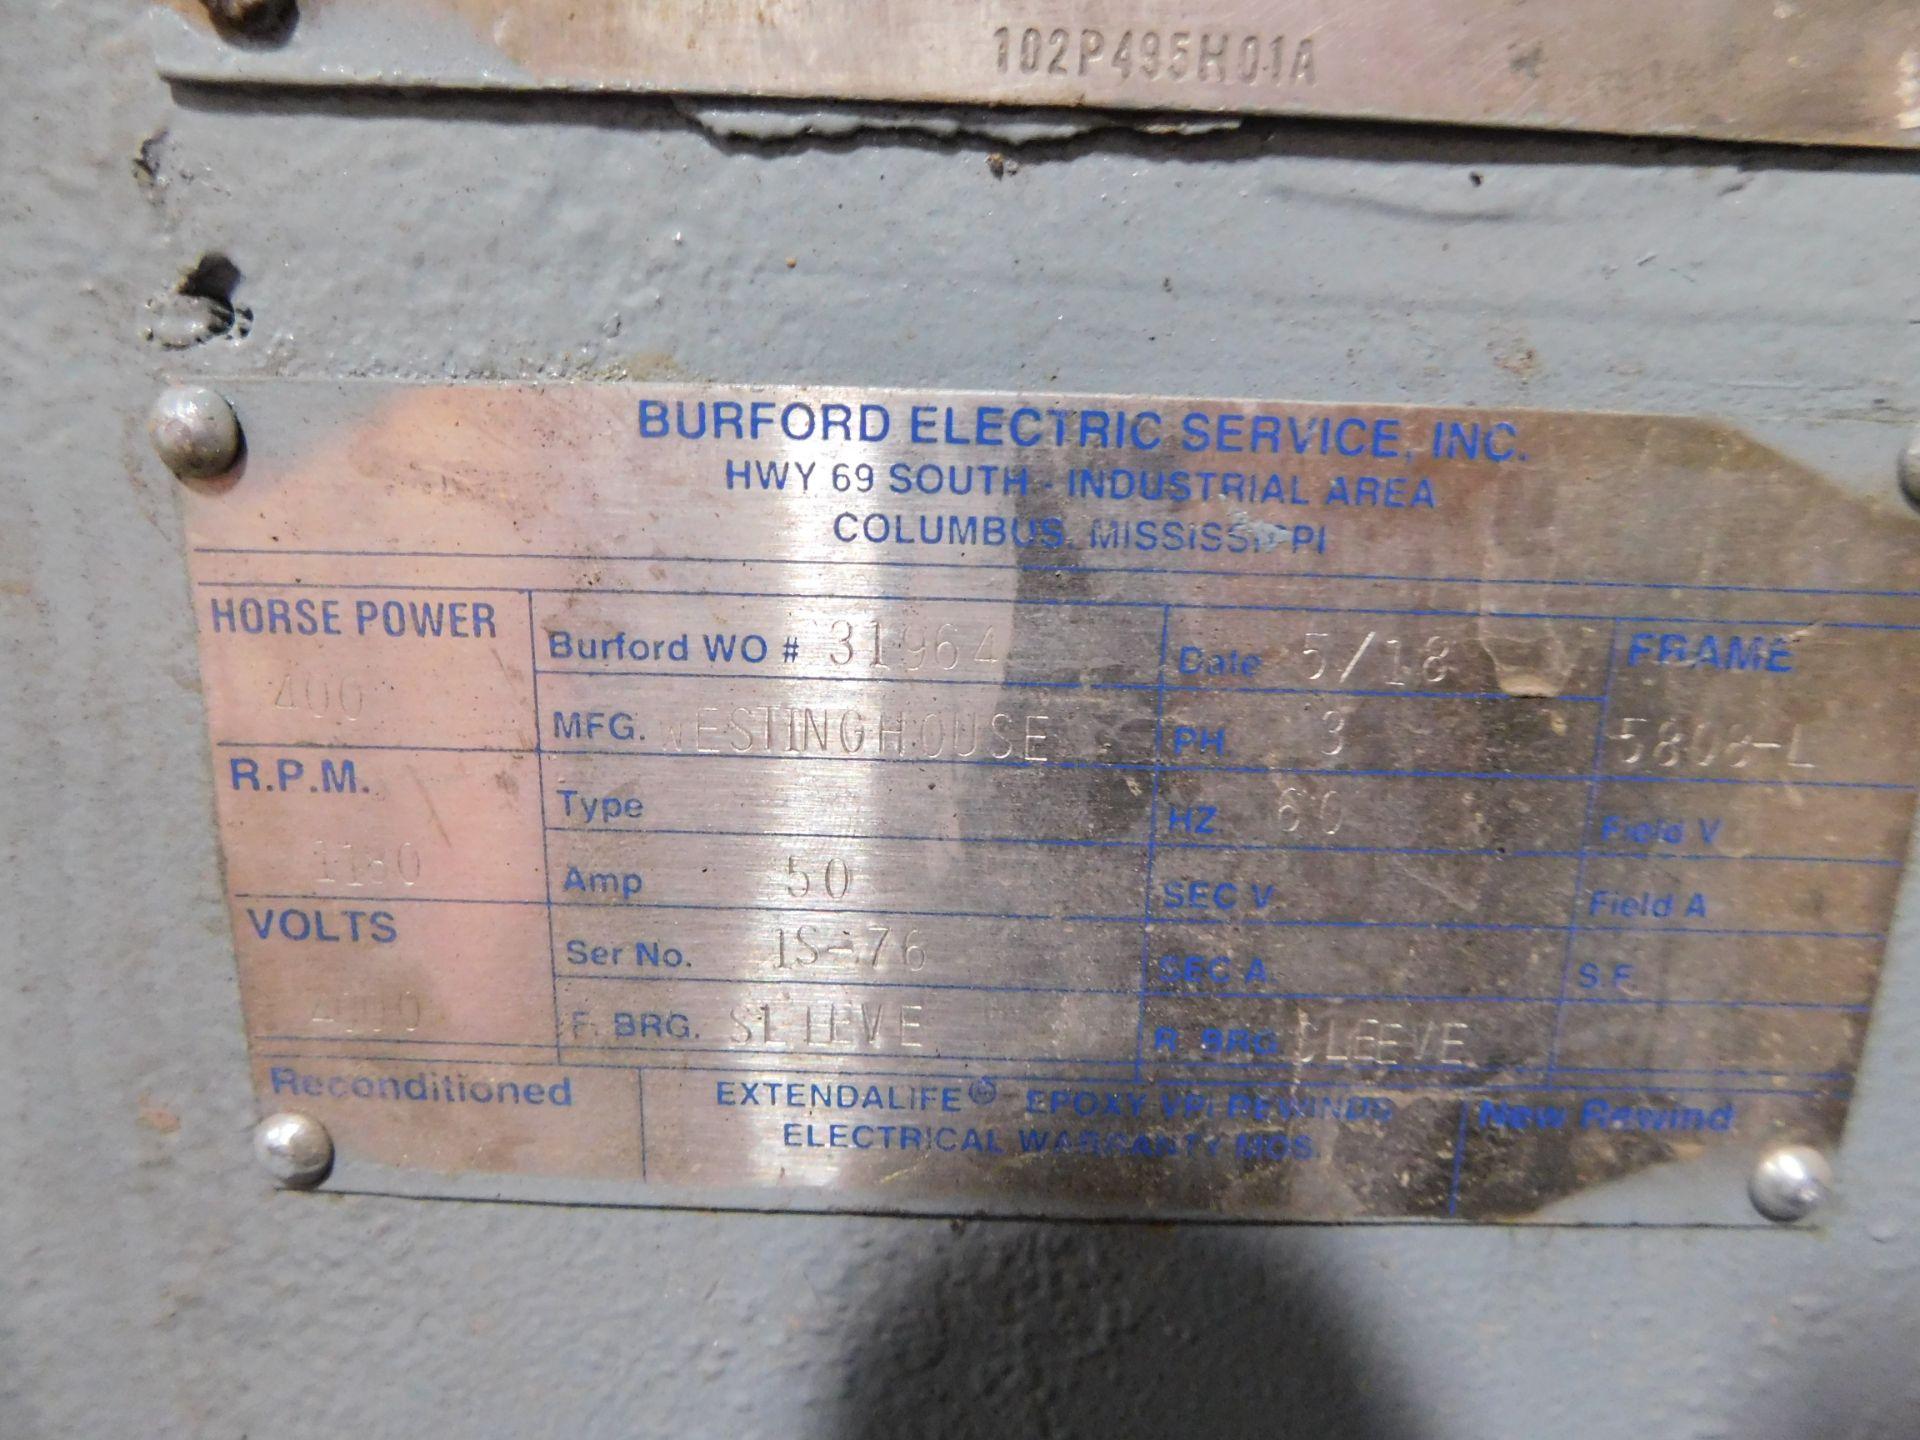 Teco Westinghouse Motor. 400 HP. 3 Ph. 1180 RPM. 4000 V. 60 Hz. 5808L. HSW1. - Image 5 of 6